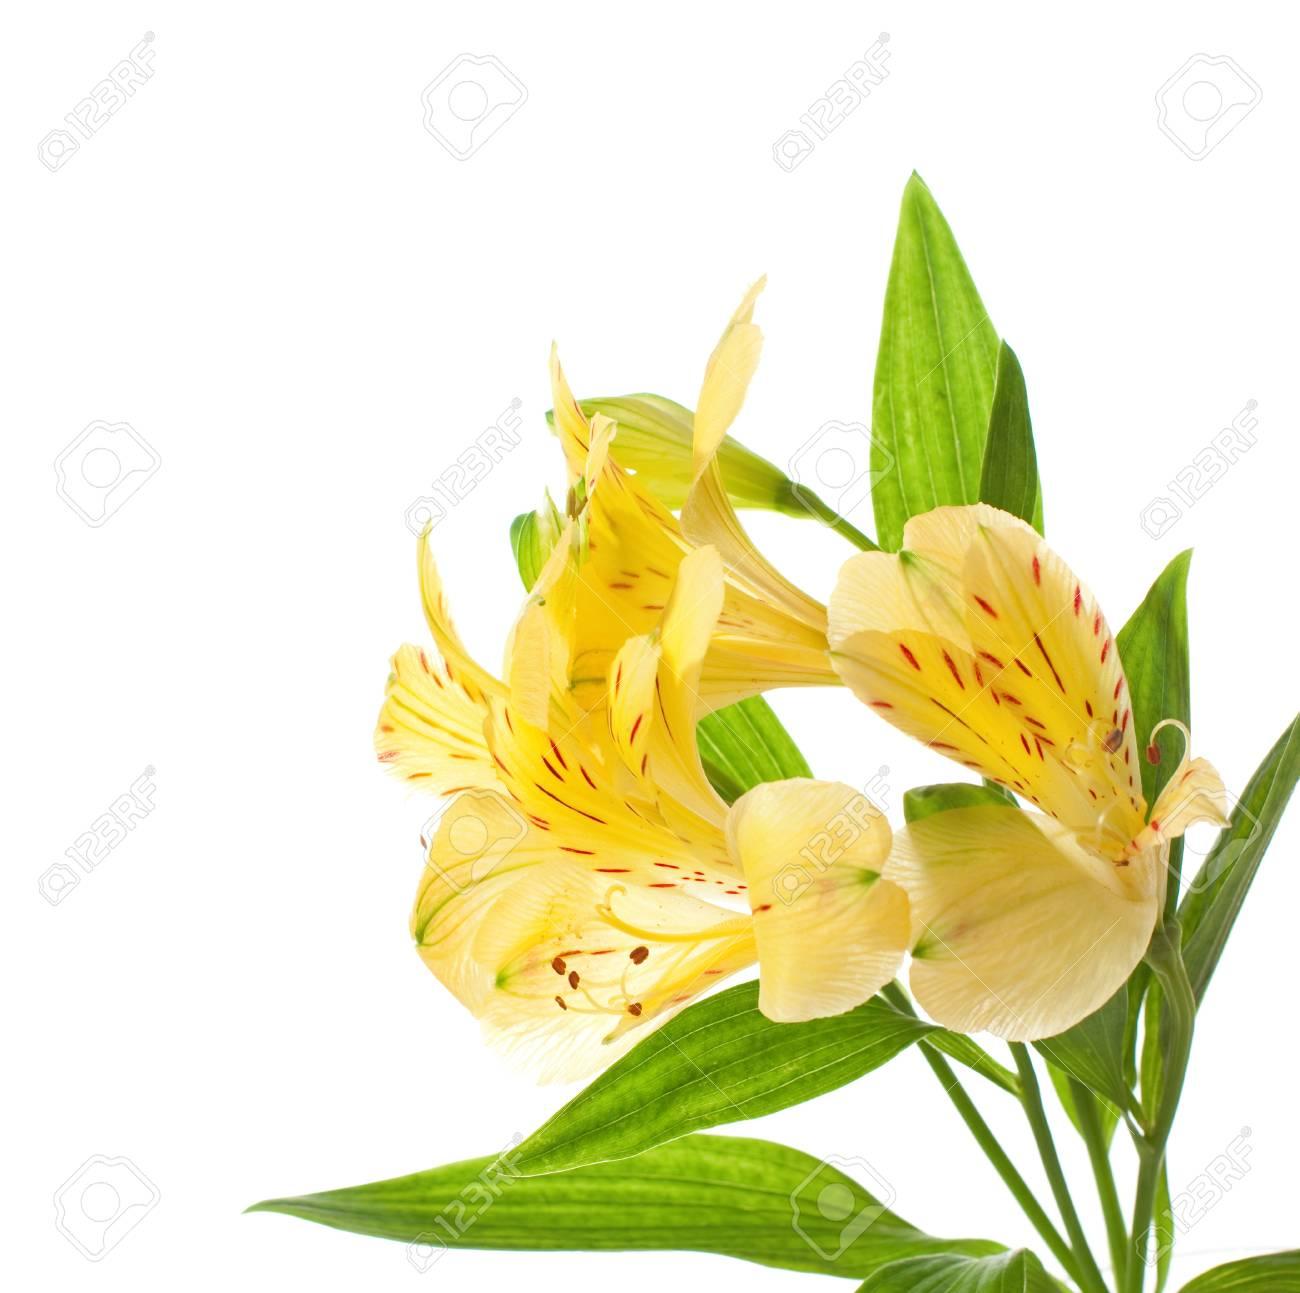 Alstroemeria flowers isolated on white background stock photo alstroemeria flowers isolated on white background stock photo 15311950 mightylinksfo